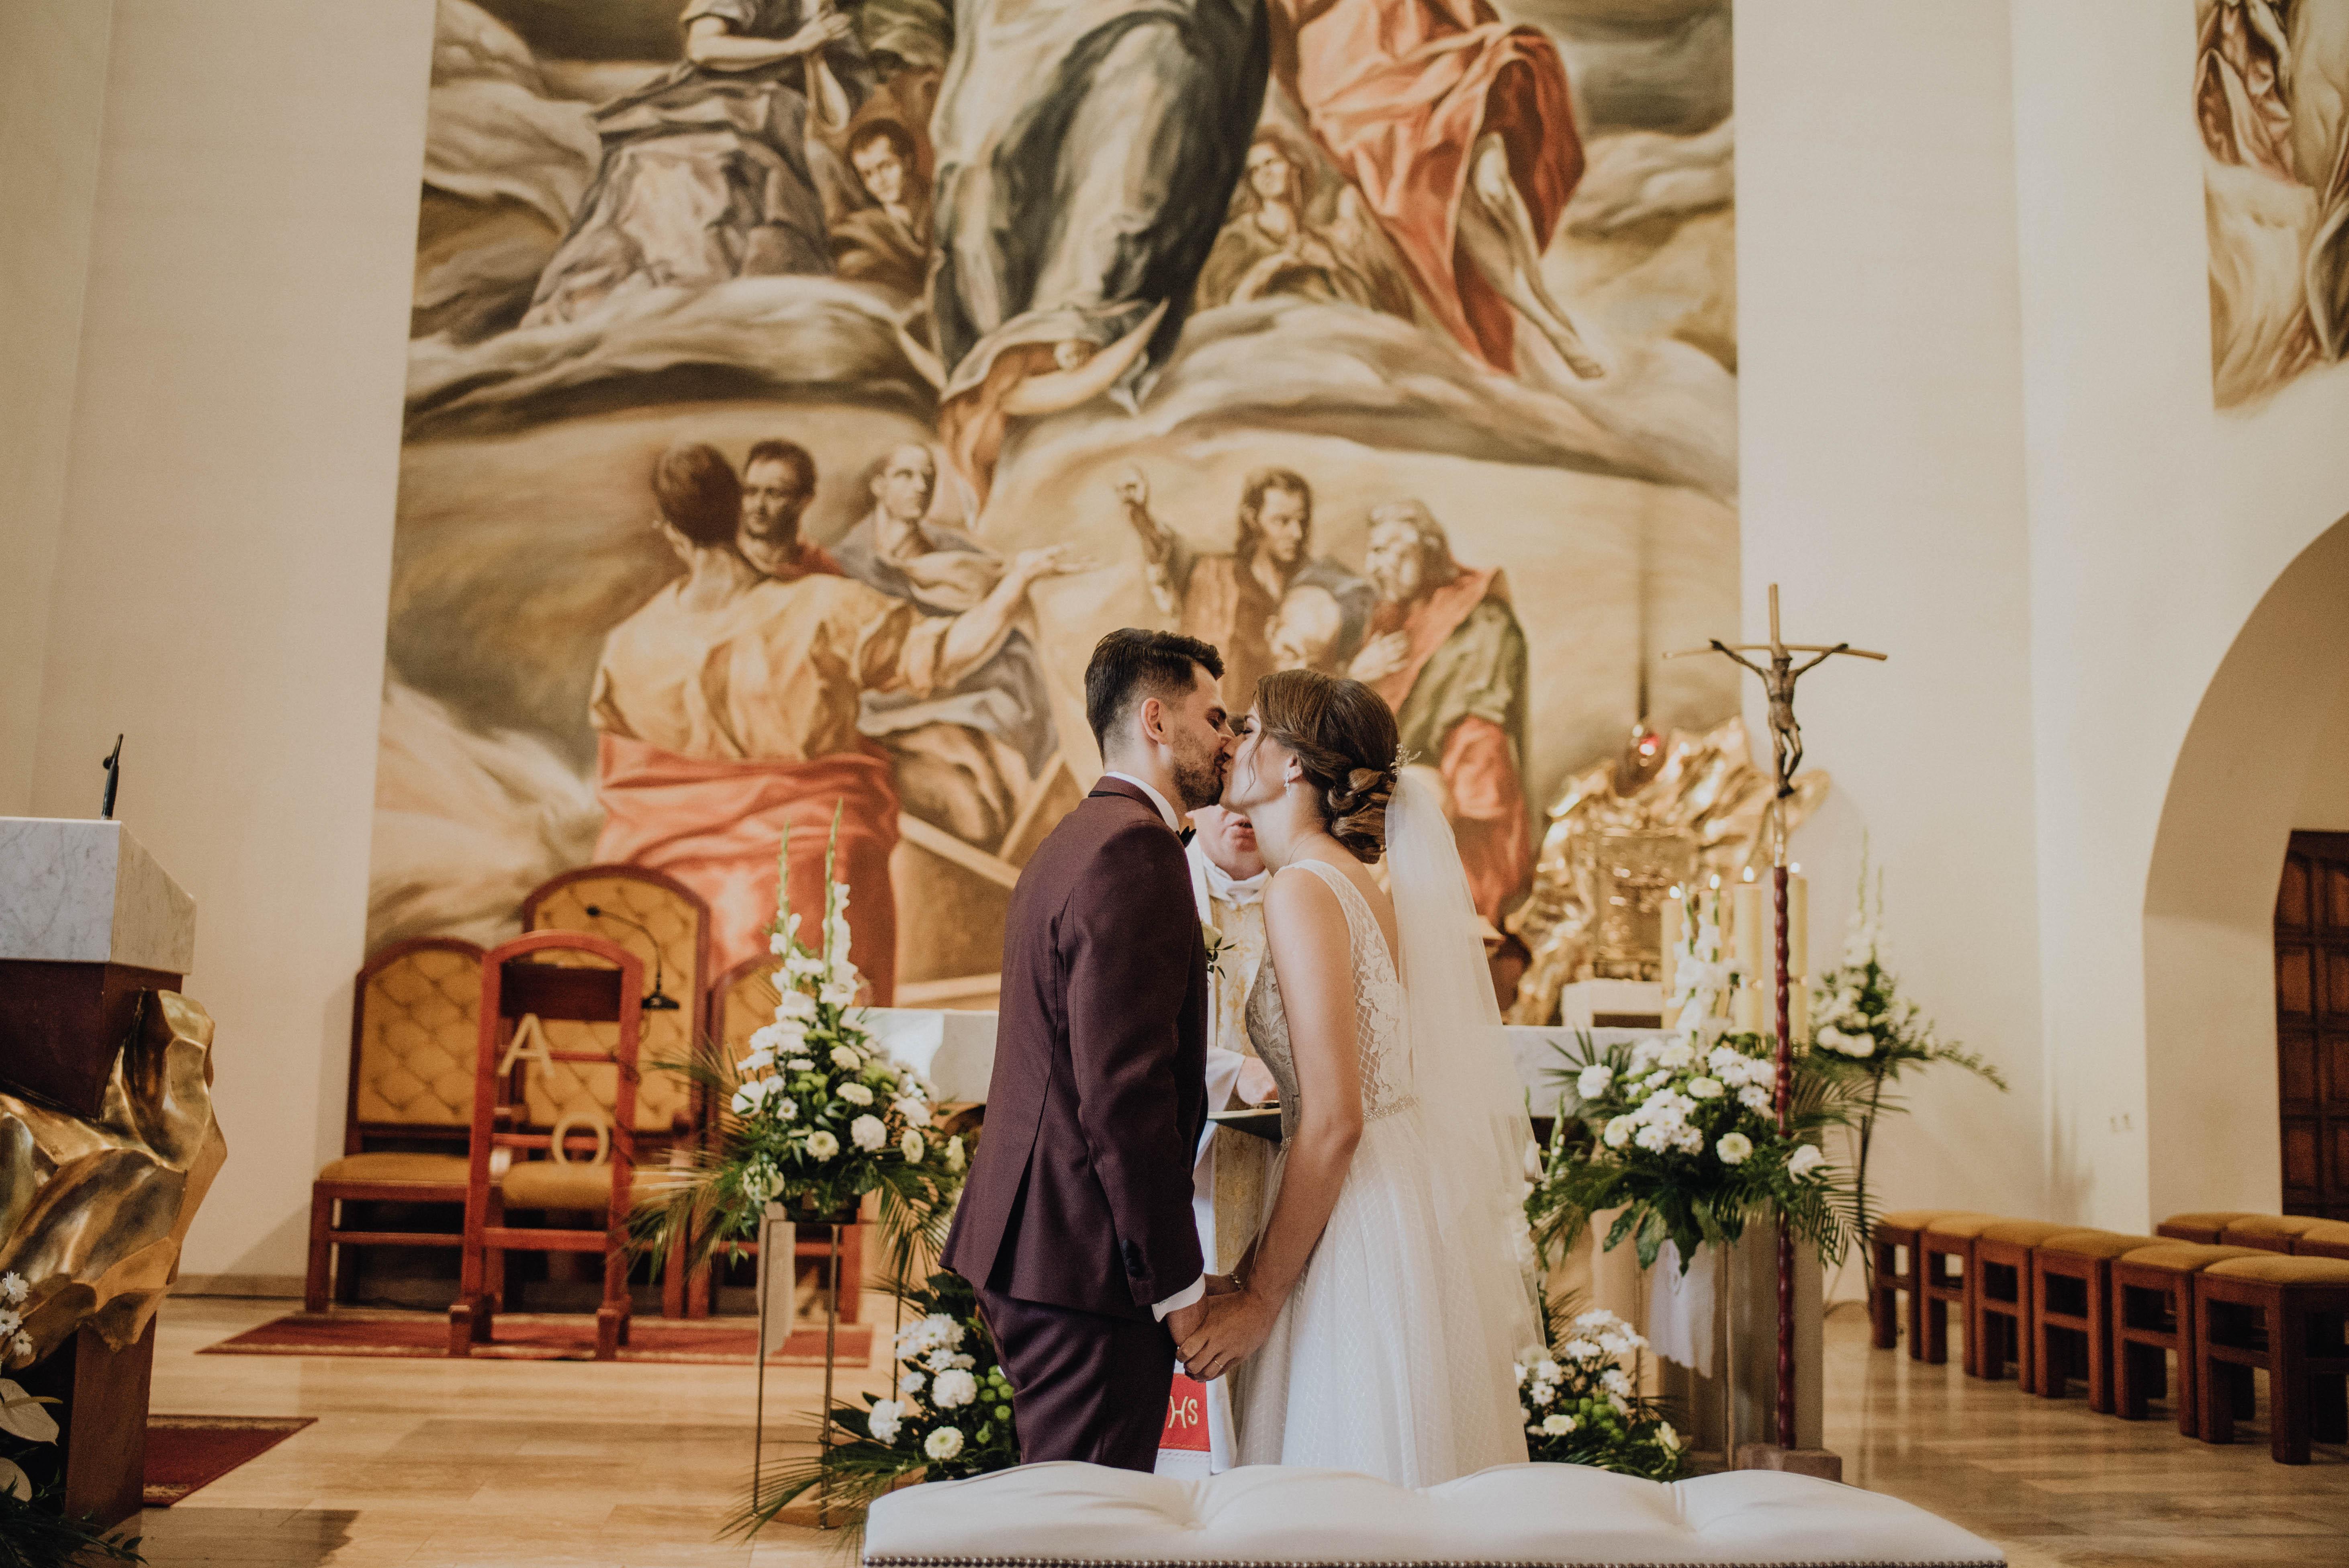 Ala i Dawid ślub